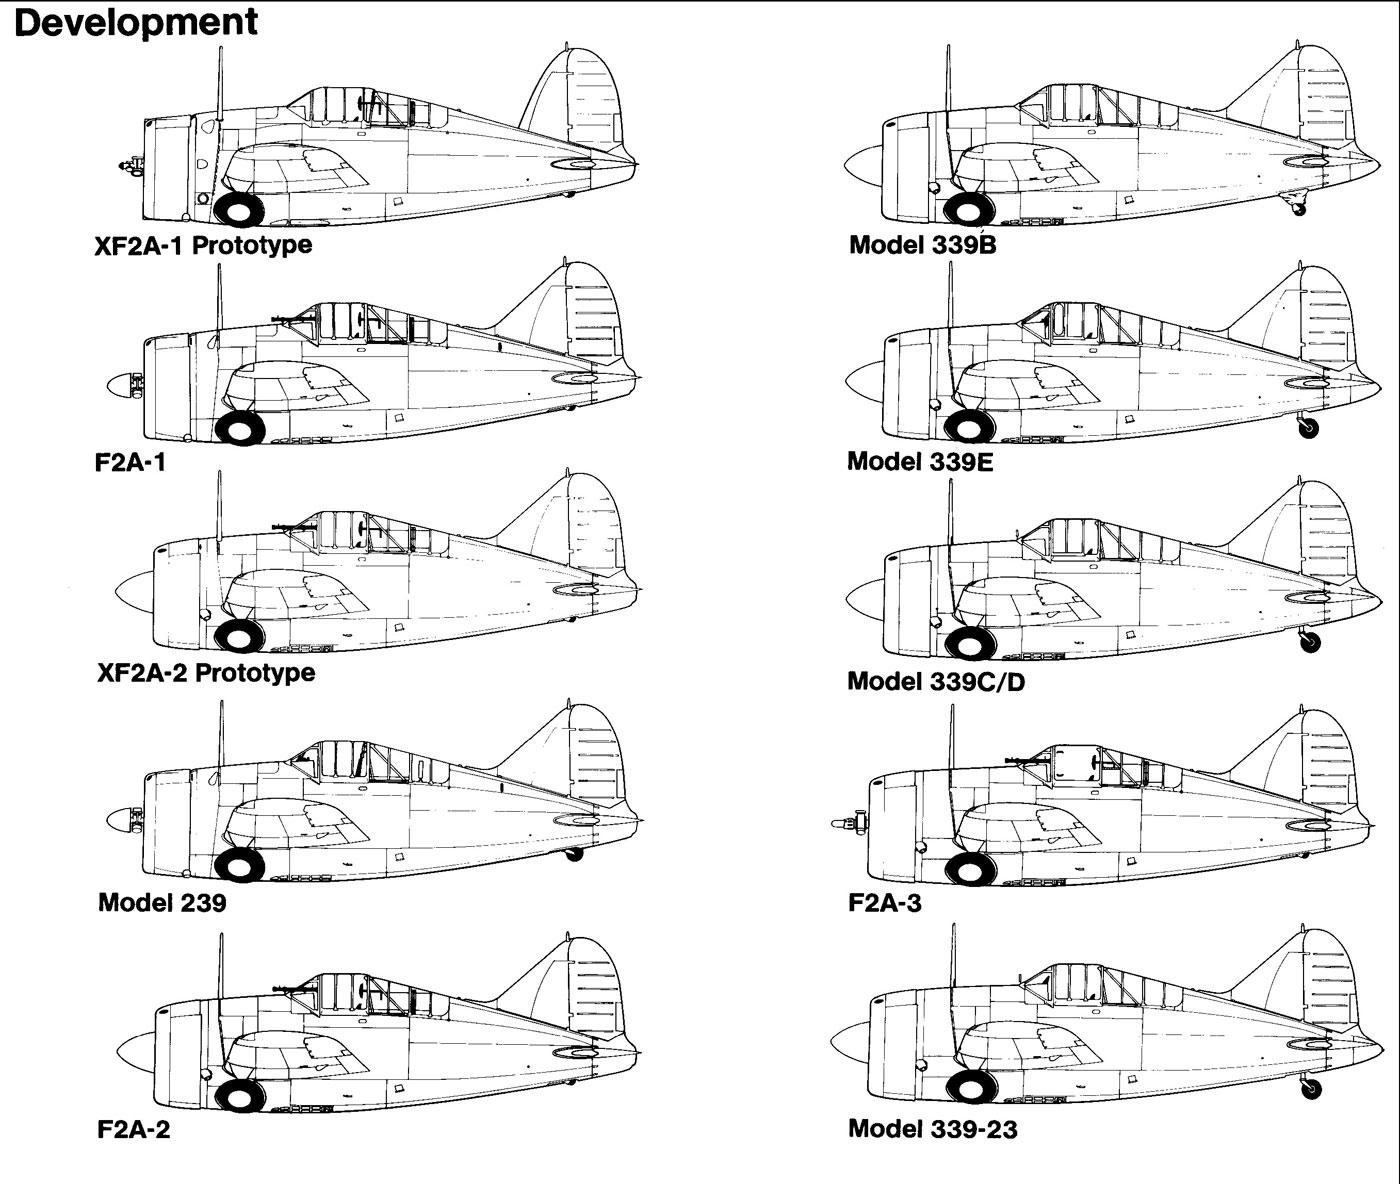 Artwork Brewster Buffalo F2A blue print showing development history 0A